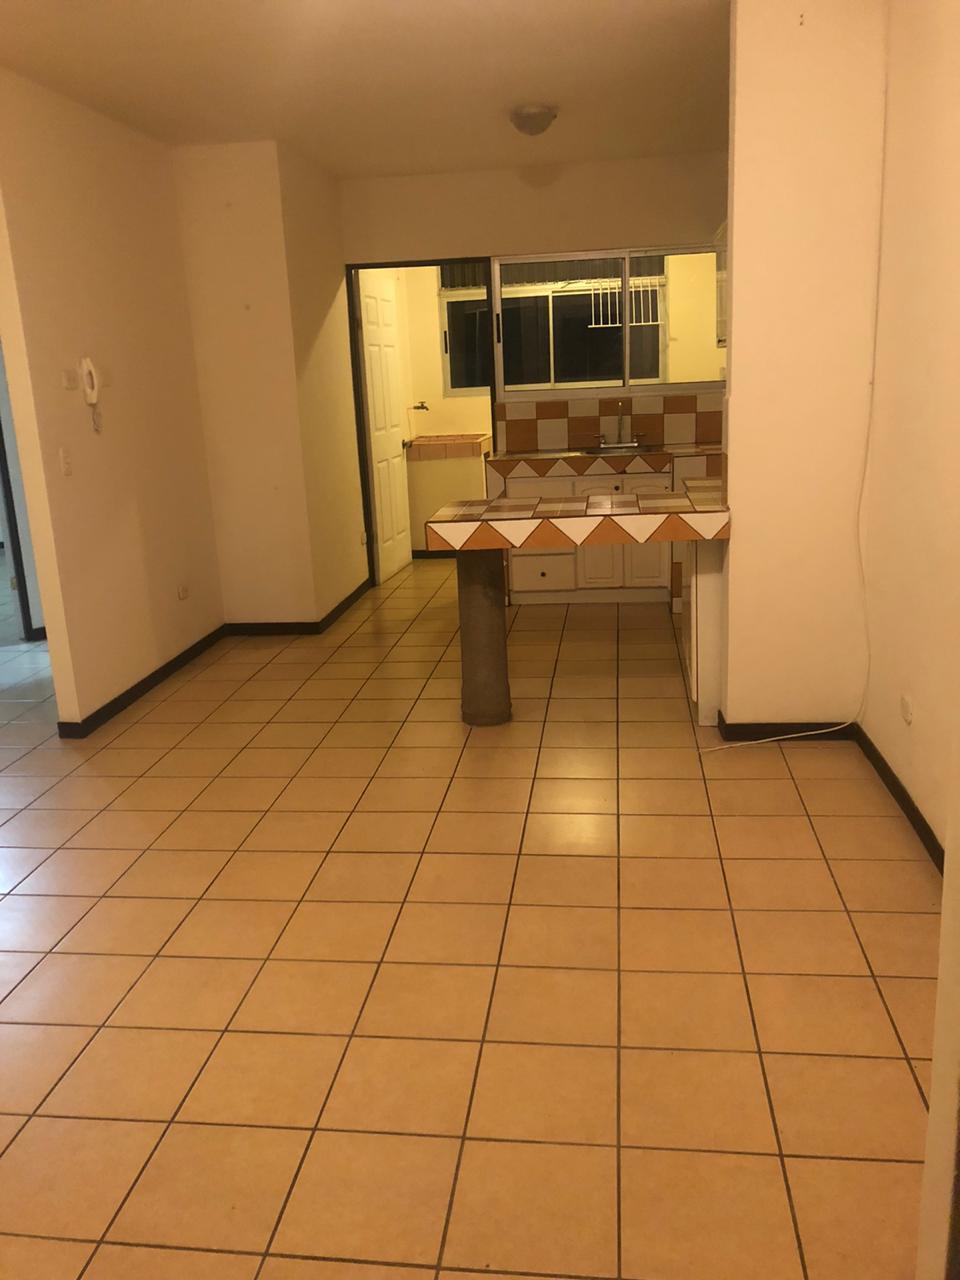 Alquiler de Apartamento, Heredia, Barreal, Residencial Casablanca